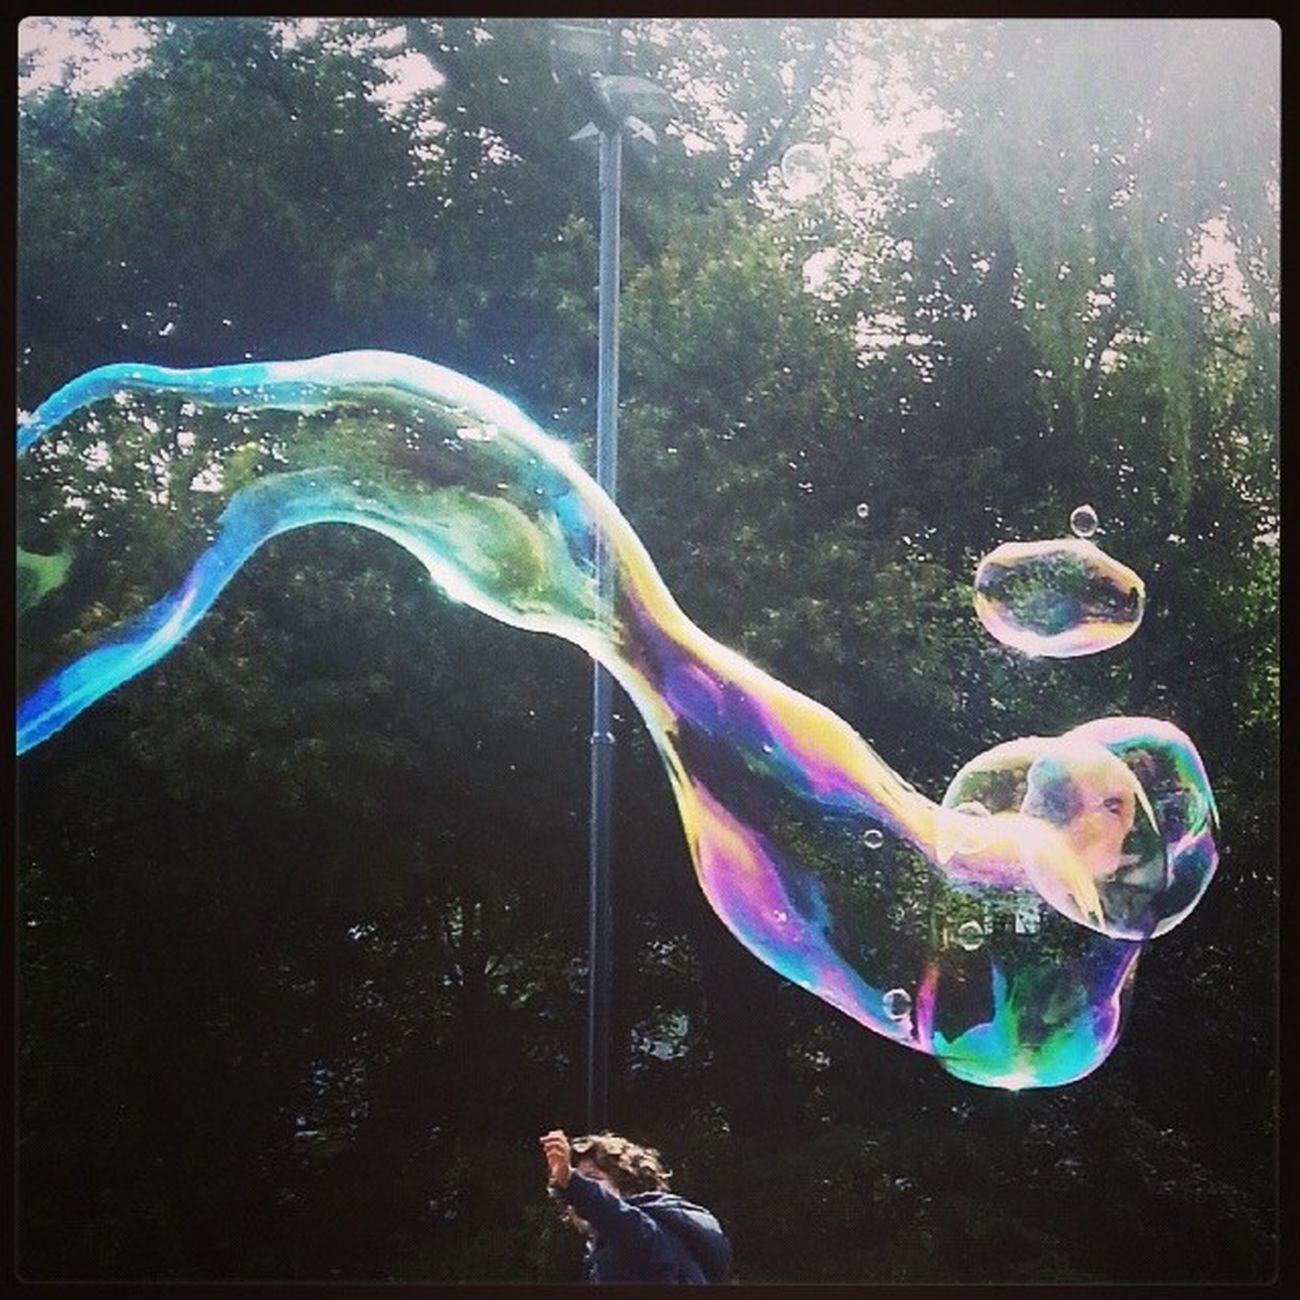 Sommer Såpebobler Bubbles Reach Fun Spikersuppa Oslo Oslobilder